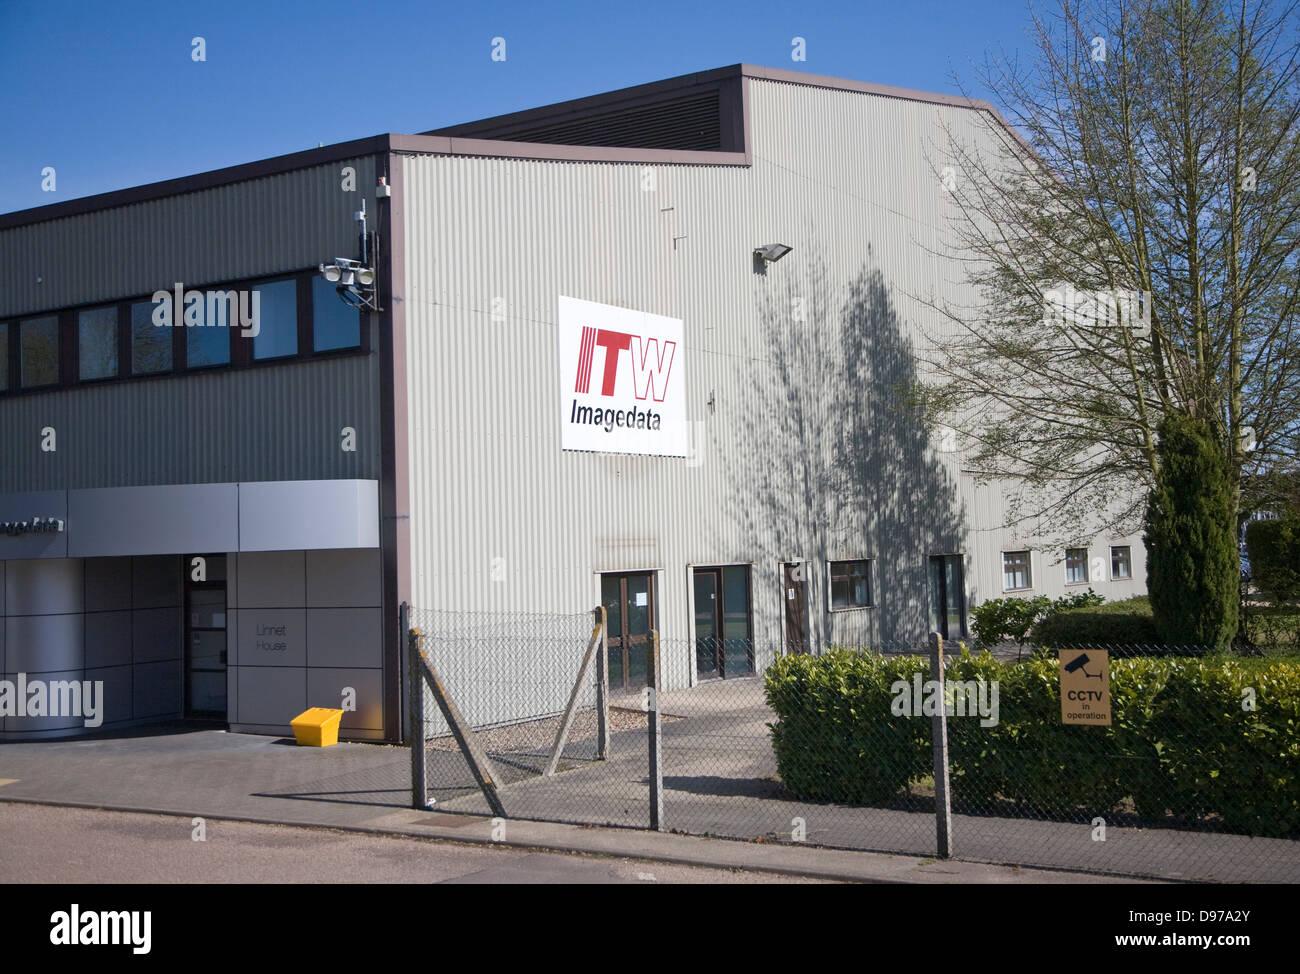 ITW Imagedata factory at Brantham, Suffolk, England - Stock Image